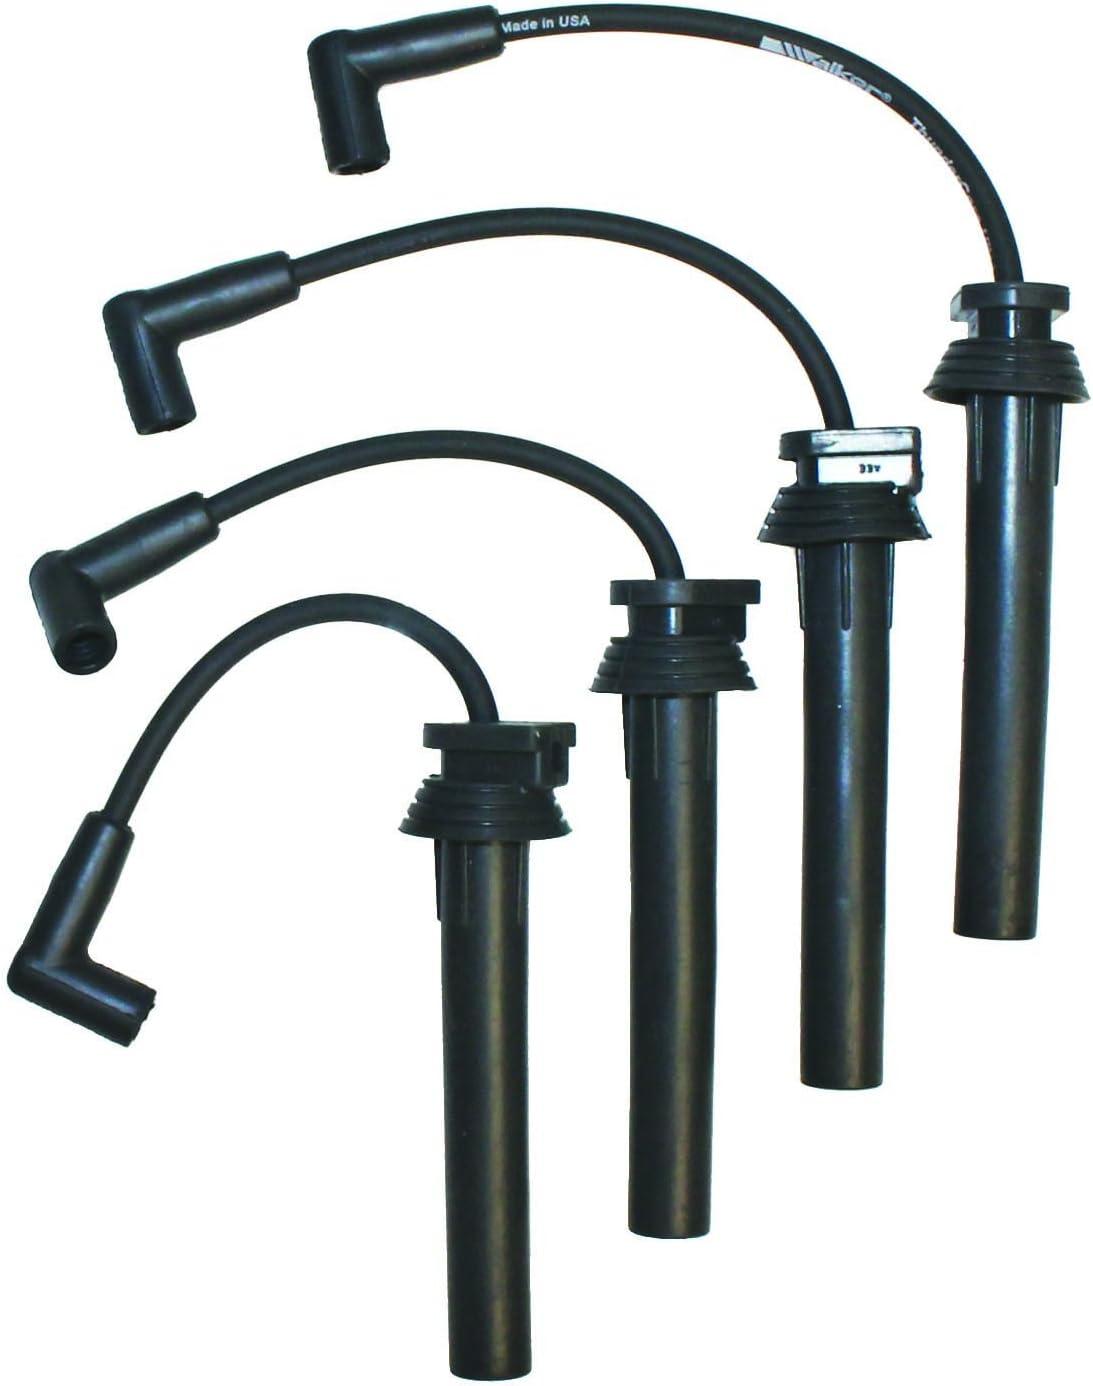 Walker Products 900-1222 Premium Spark Wire Set Plug Special San Antonio Mall sale item